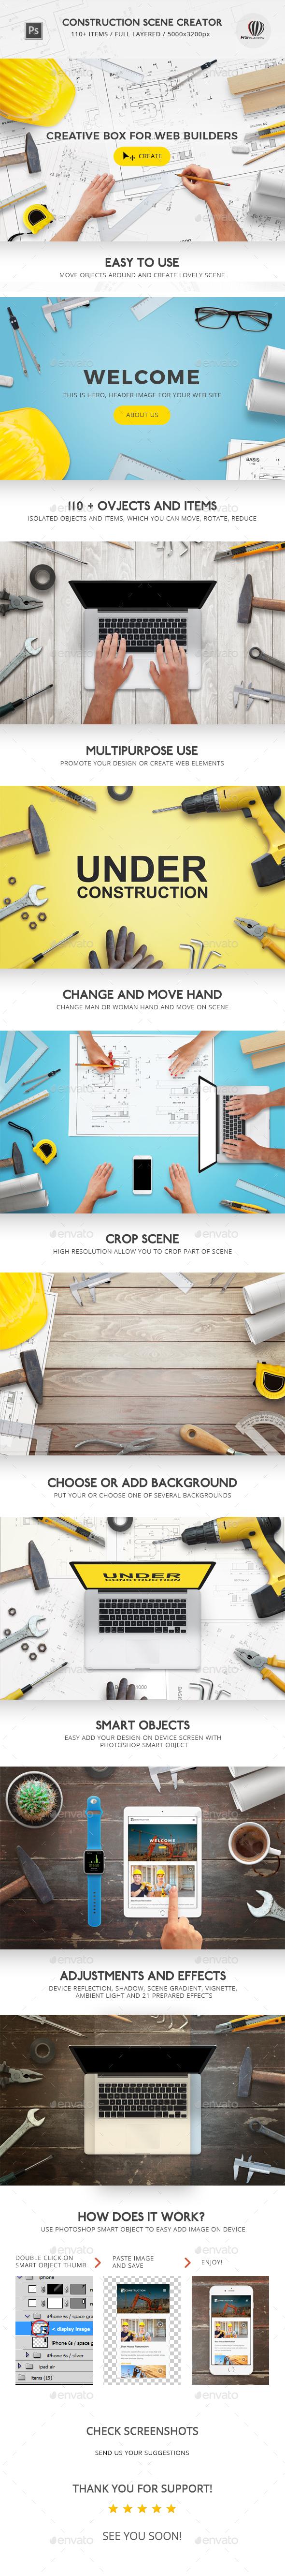 Construction Scene Creator - Hero Images Graphics